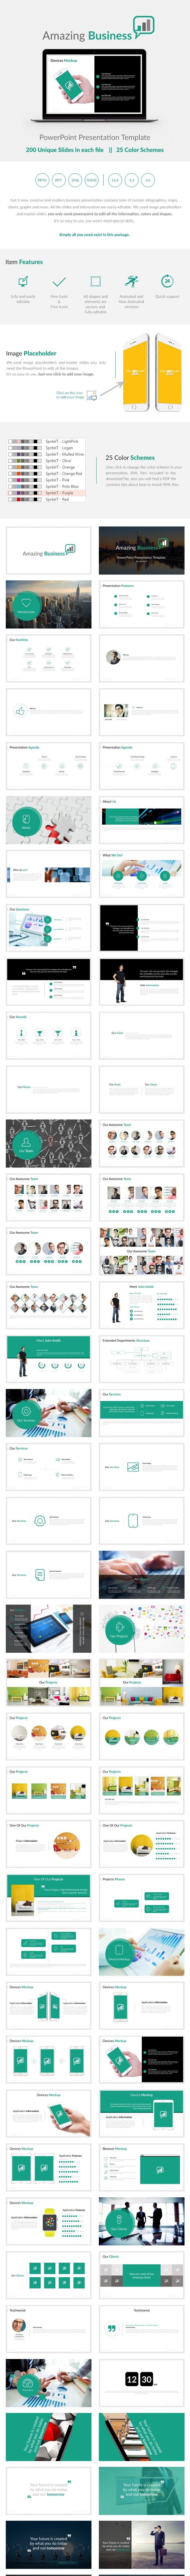 Amazing Business PowerPoint Presentation Template - Business PowerPoint Templates